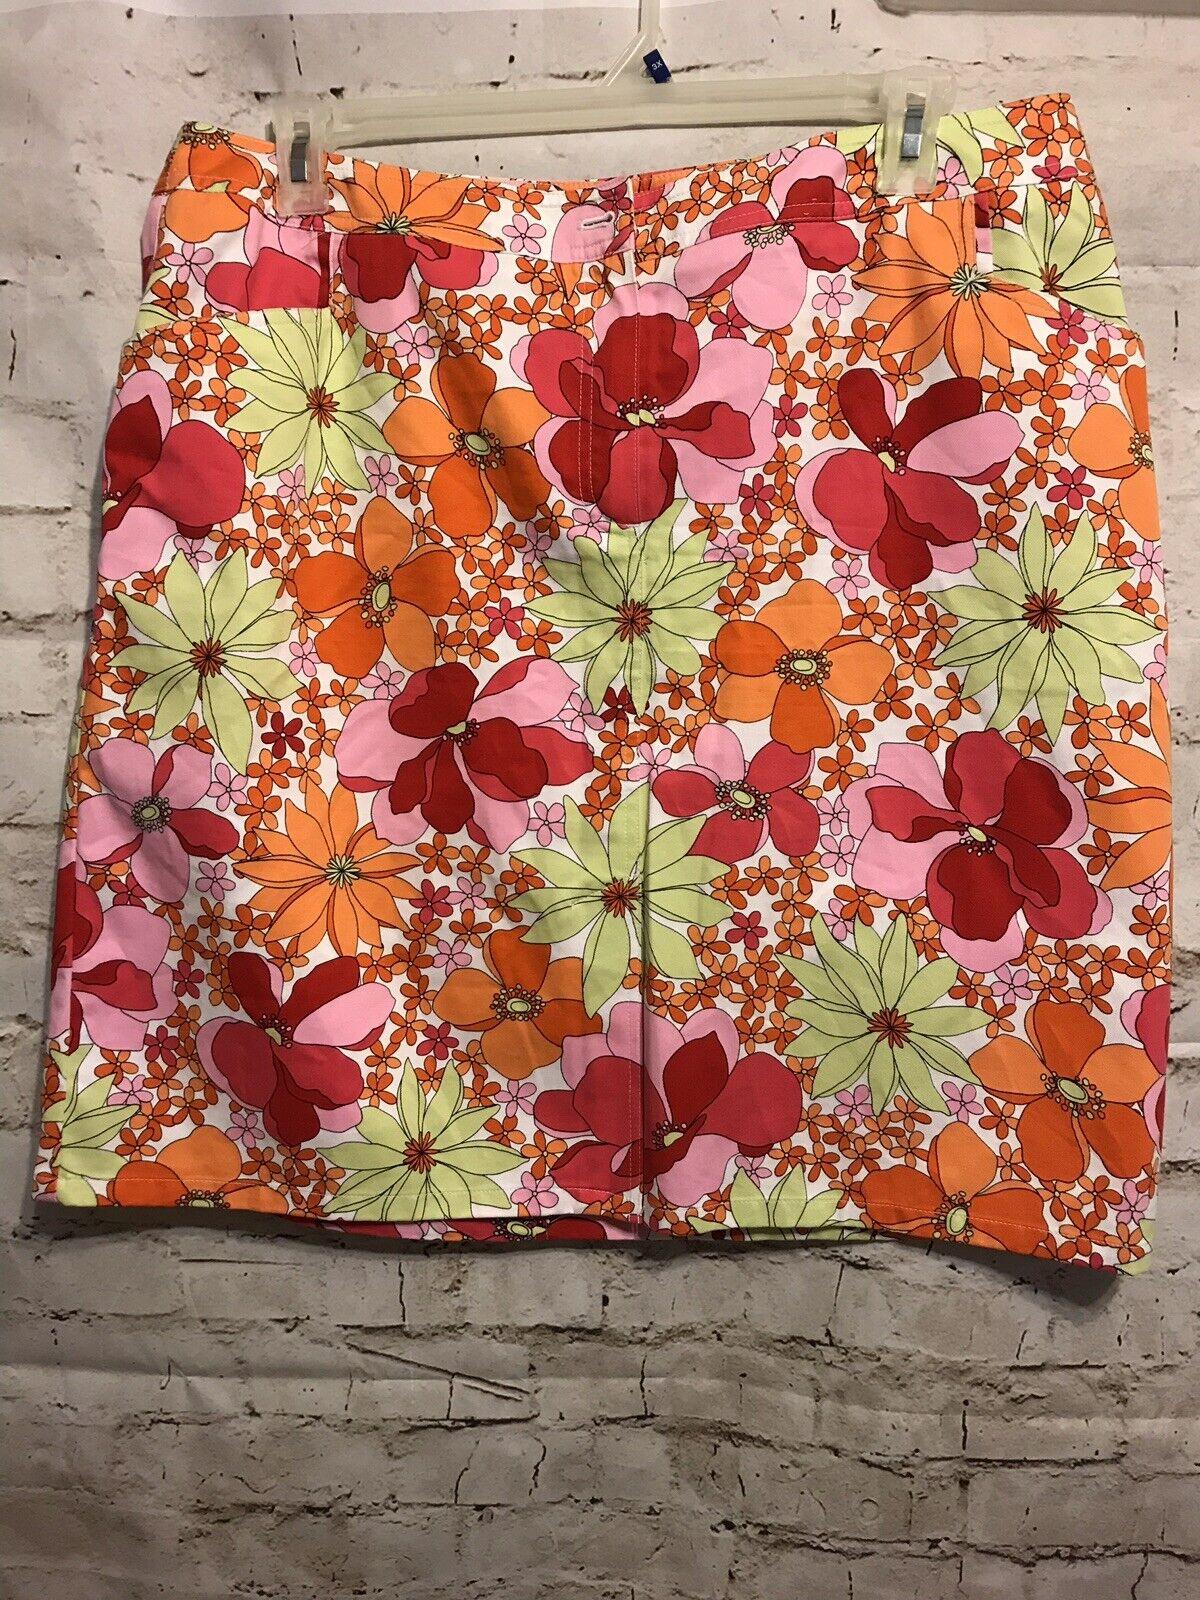 Talbots Skirt 16W Woman Petites A line Floral Design 100% Cotton Lined Side Zip